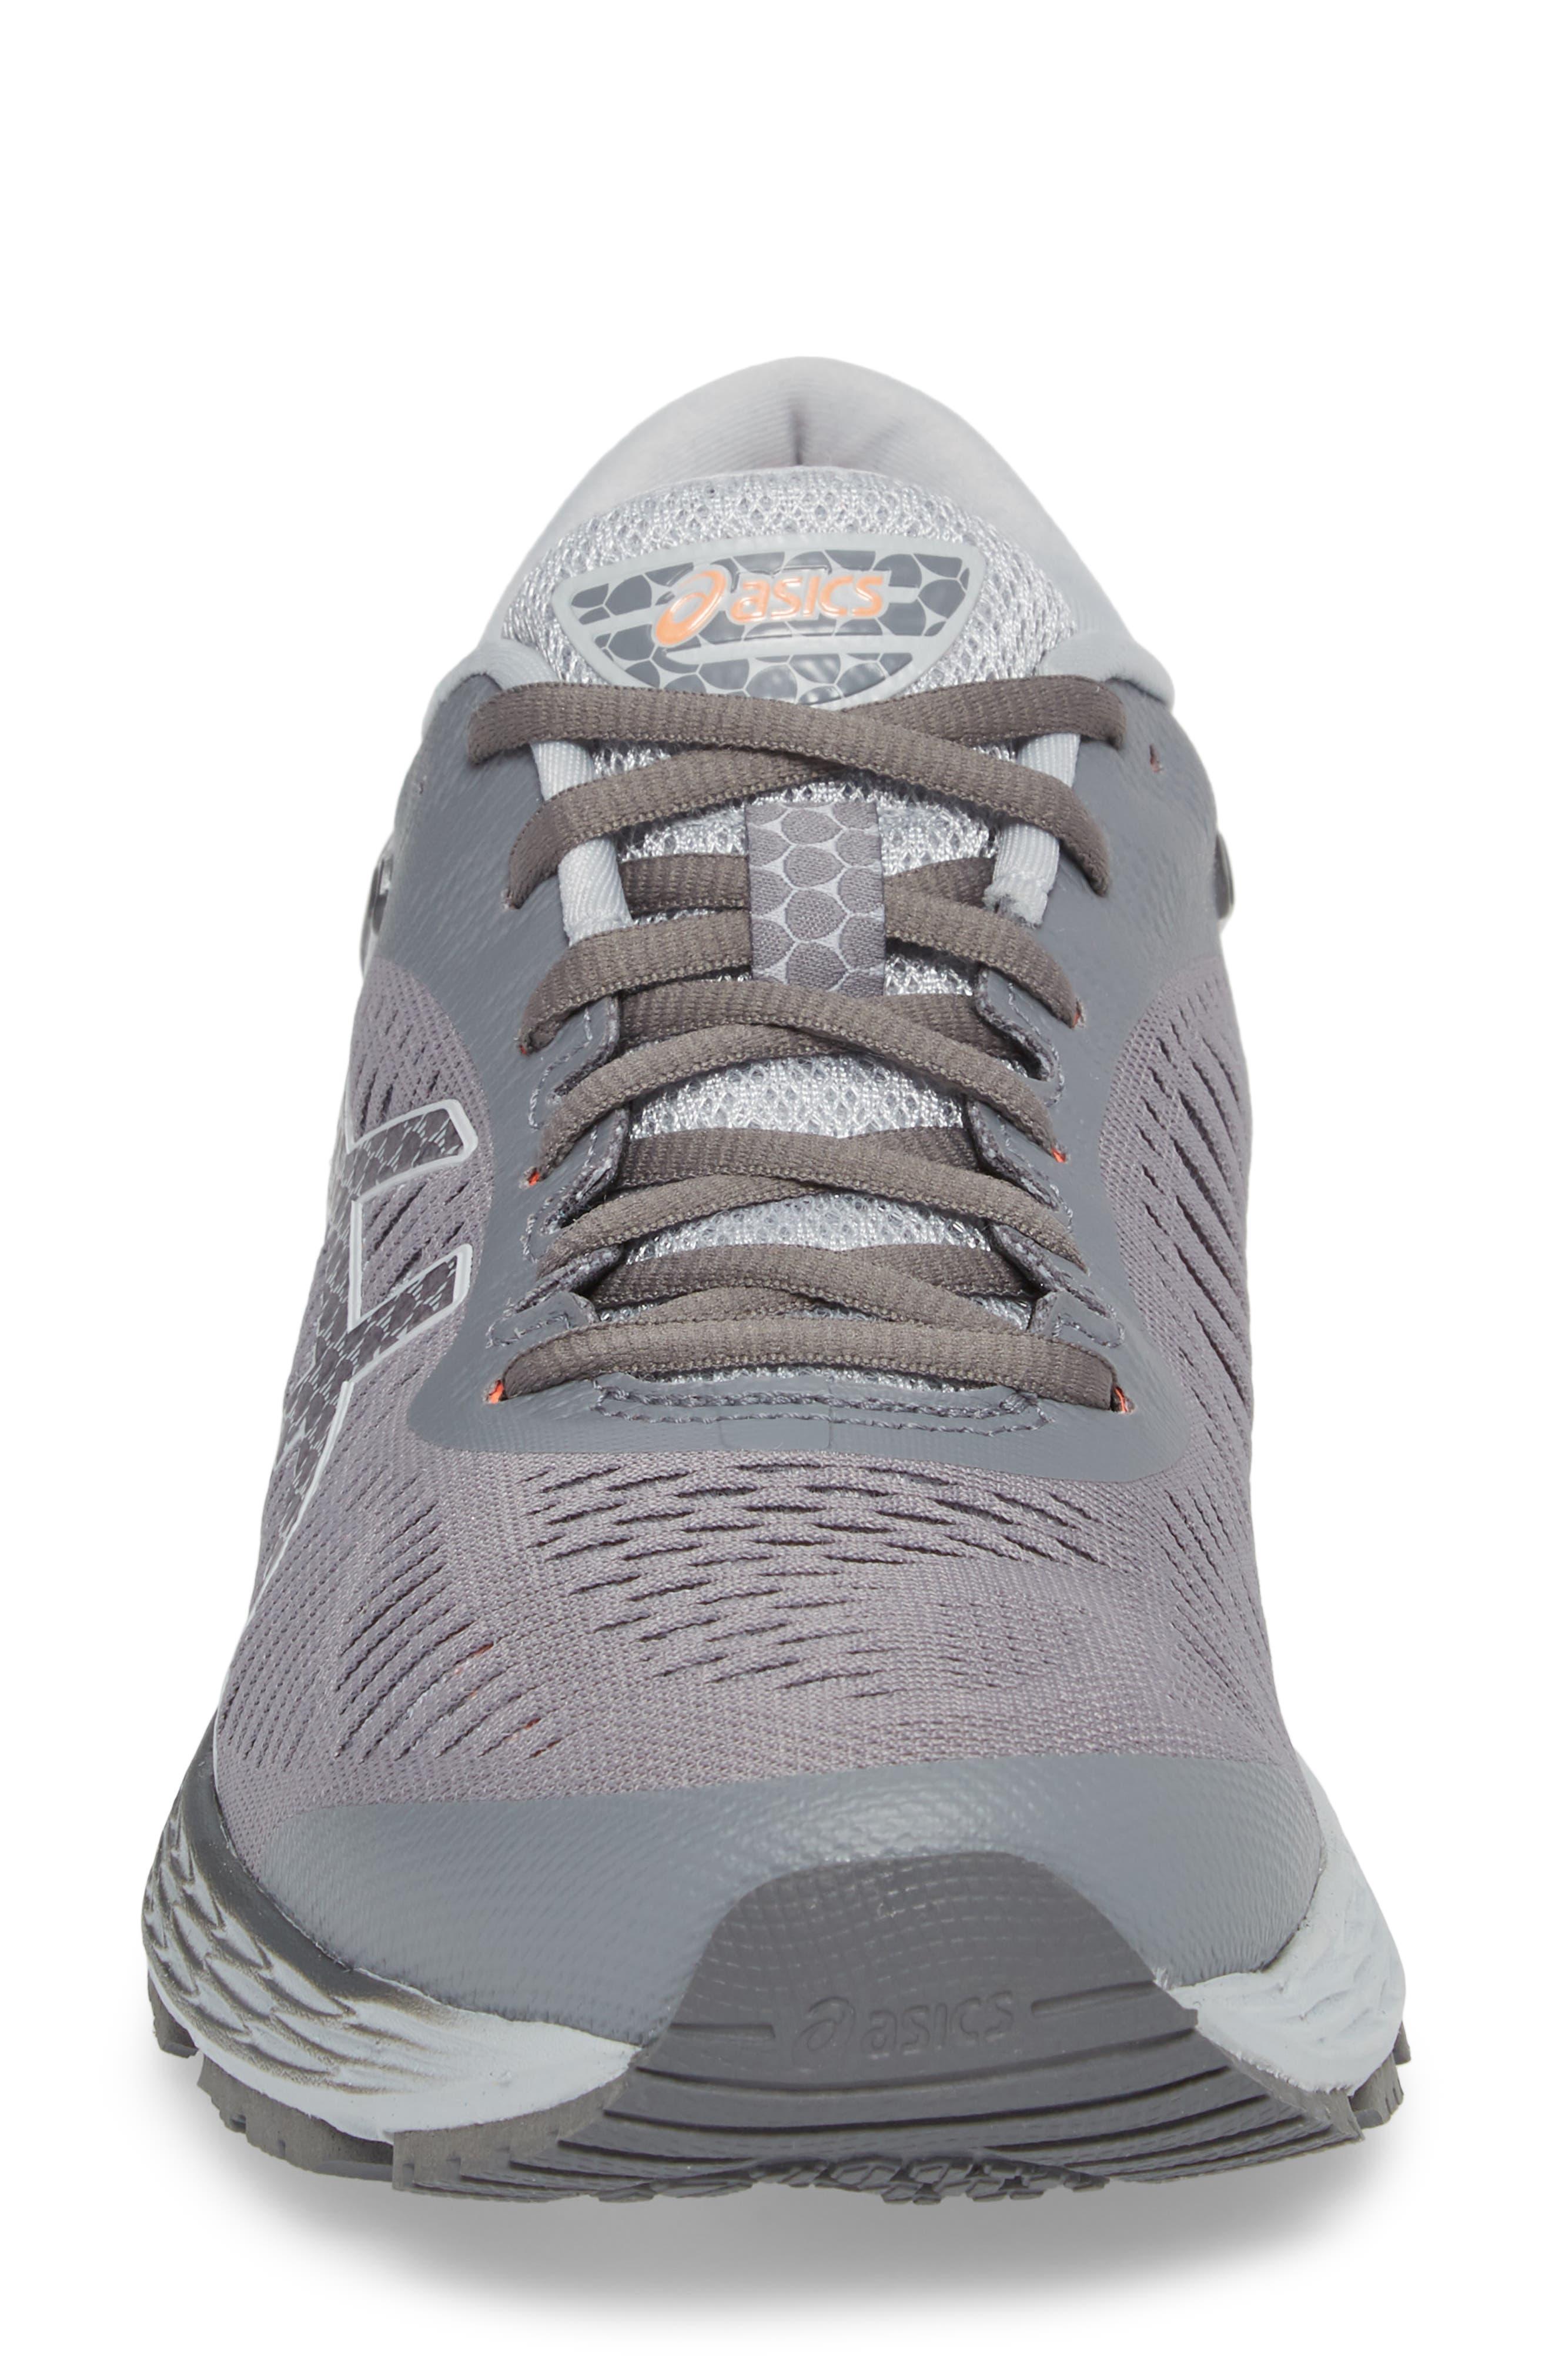 ASICS<SUP>®</SUP>, GEL-Kayano<sup>®</sup> 25 Running Shoe, Alternate thumbnail 4, color, CARBON/ MID GREY